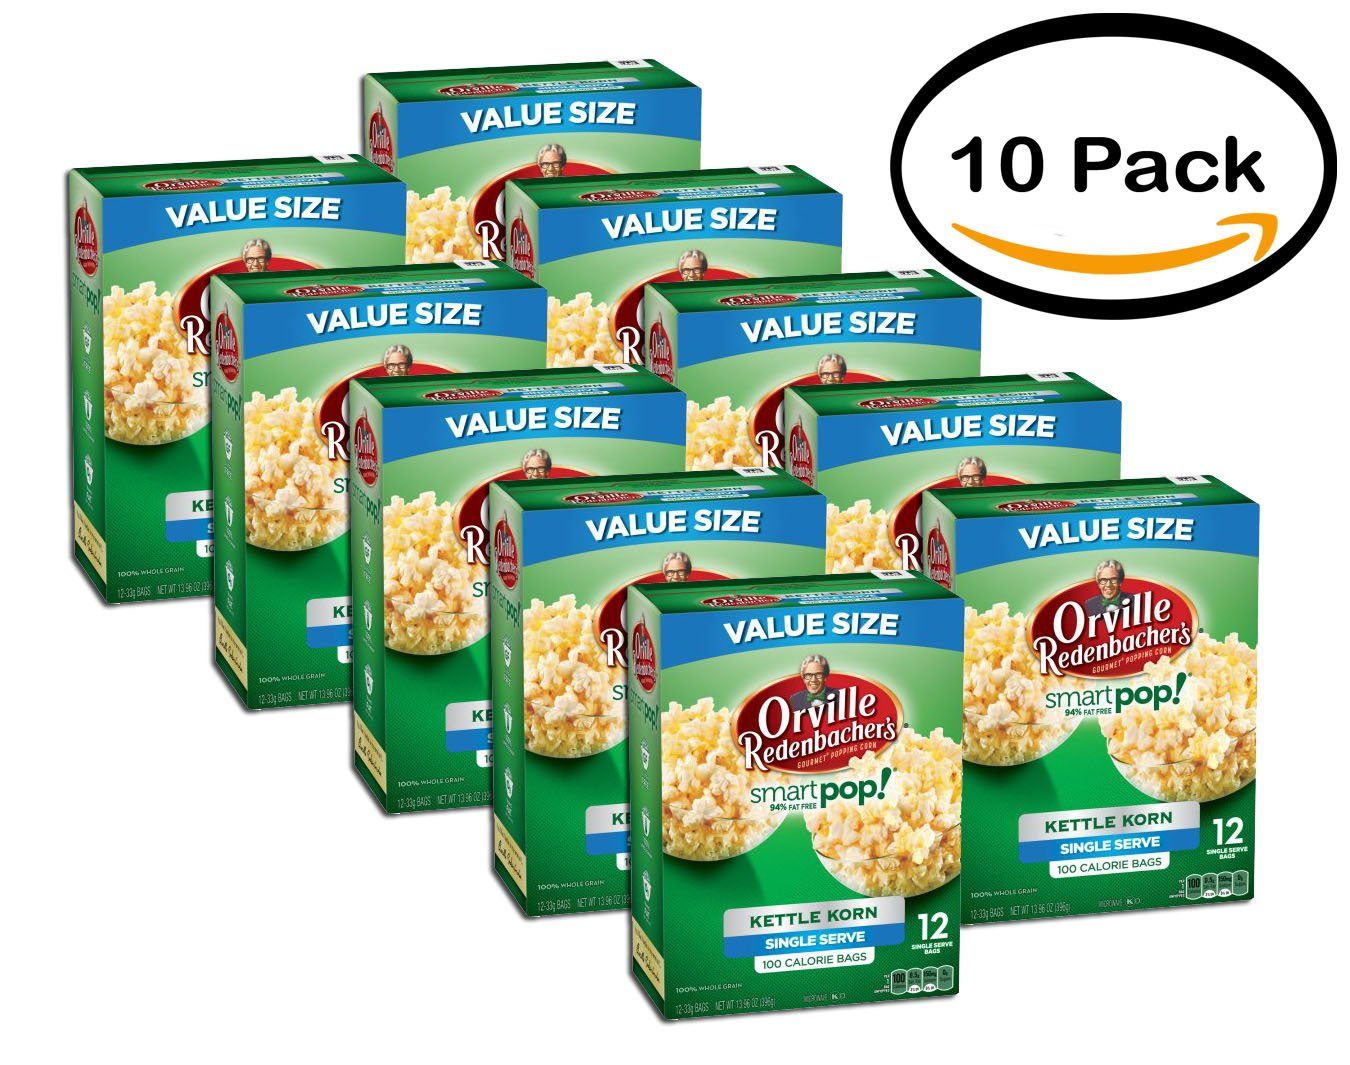 PACK OF 10 - Orville Redenbacher's SmartPop! Kettle Korn Popcorn, Single Serve Bag, 12-Count by Orville Redenbacher's